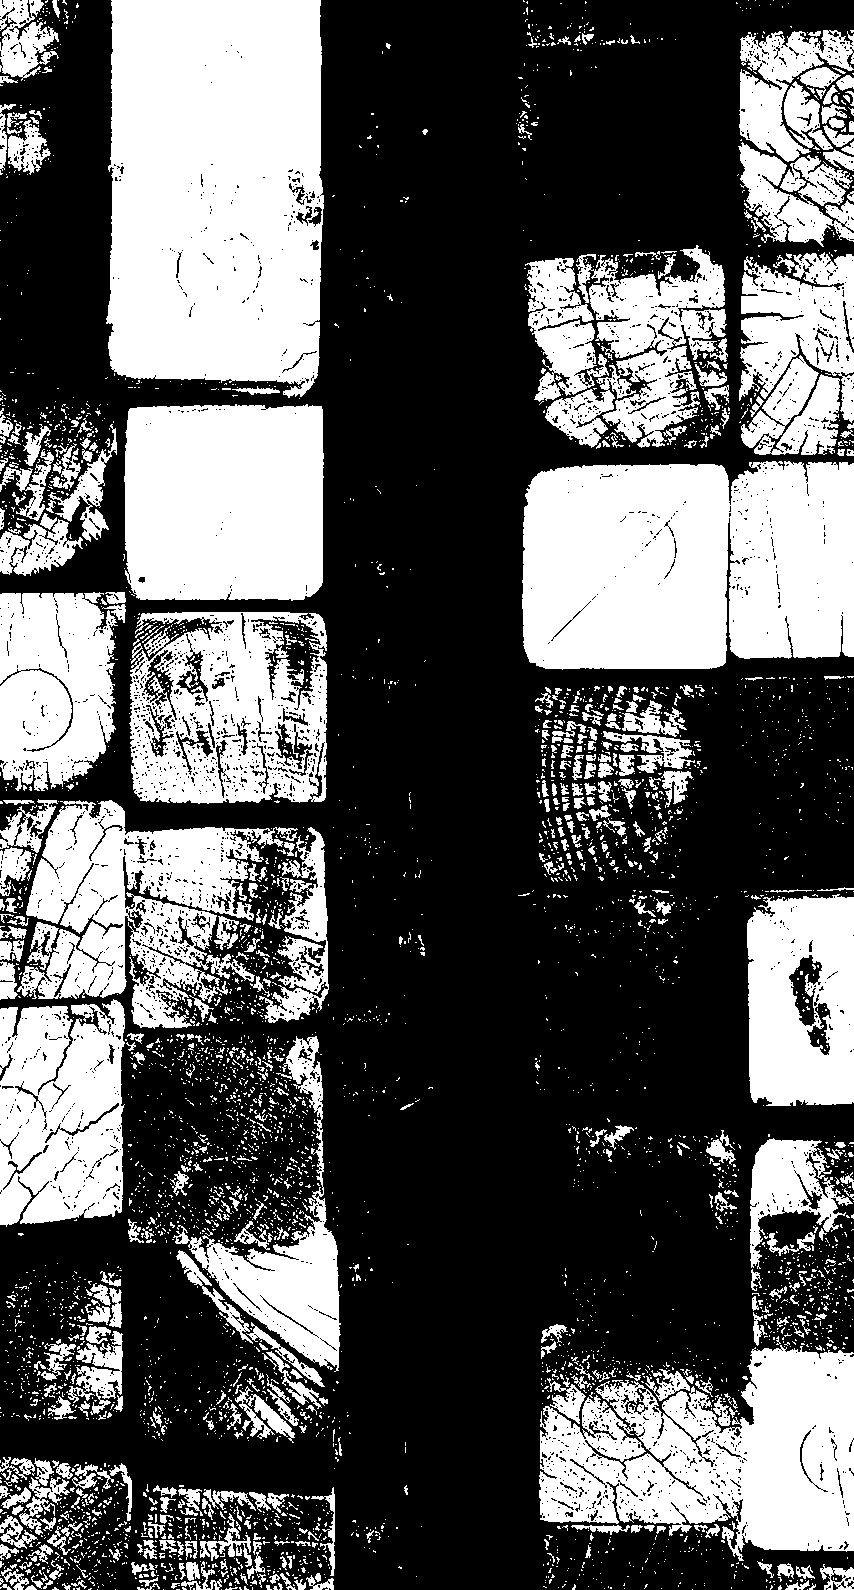 Gambar Wa Hitam Putih : gambar, hitam, putih, Hitam, Putih, Wallpapers, Wallpaper